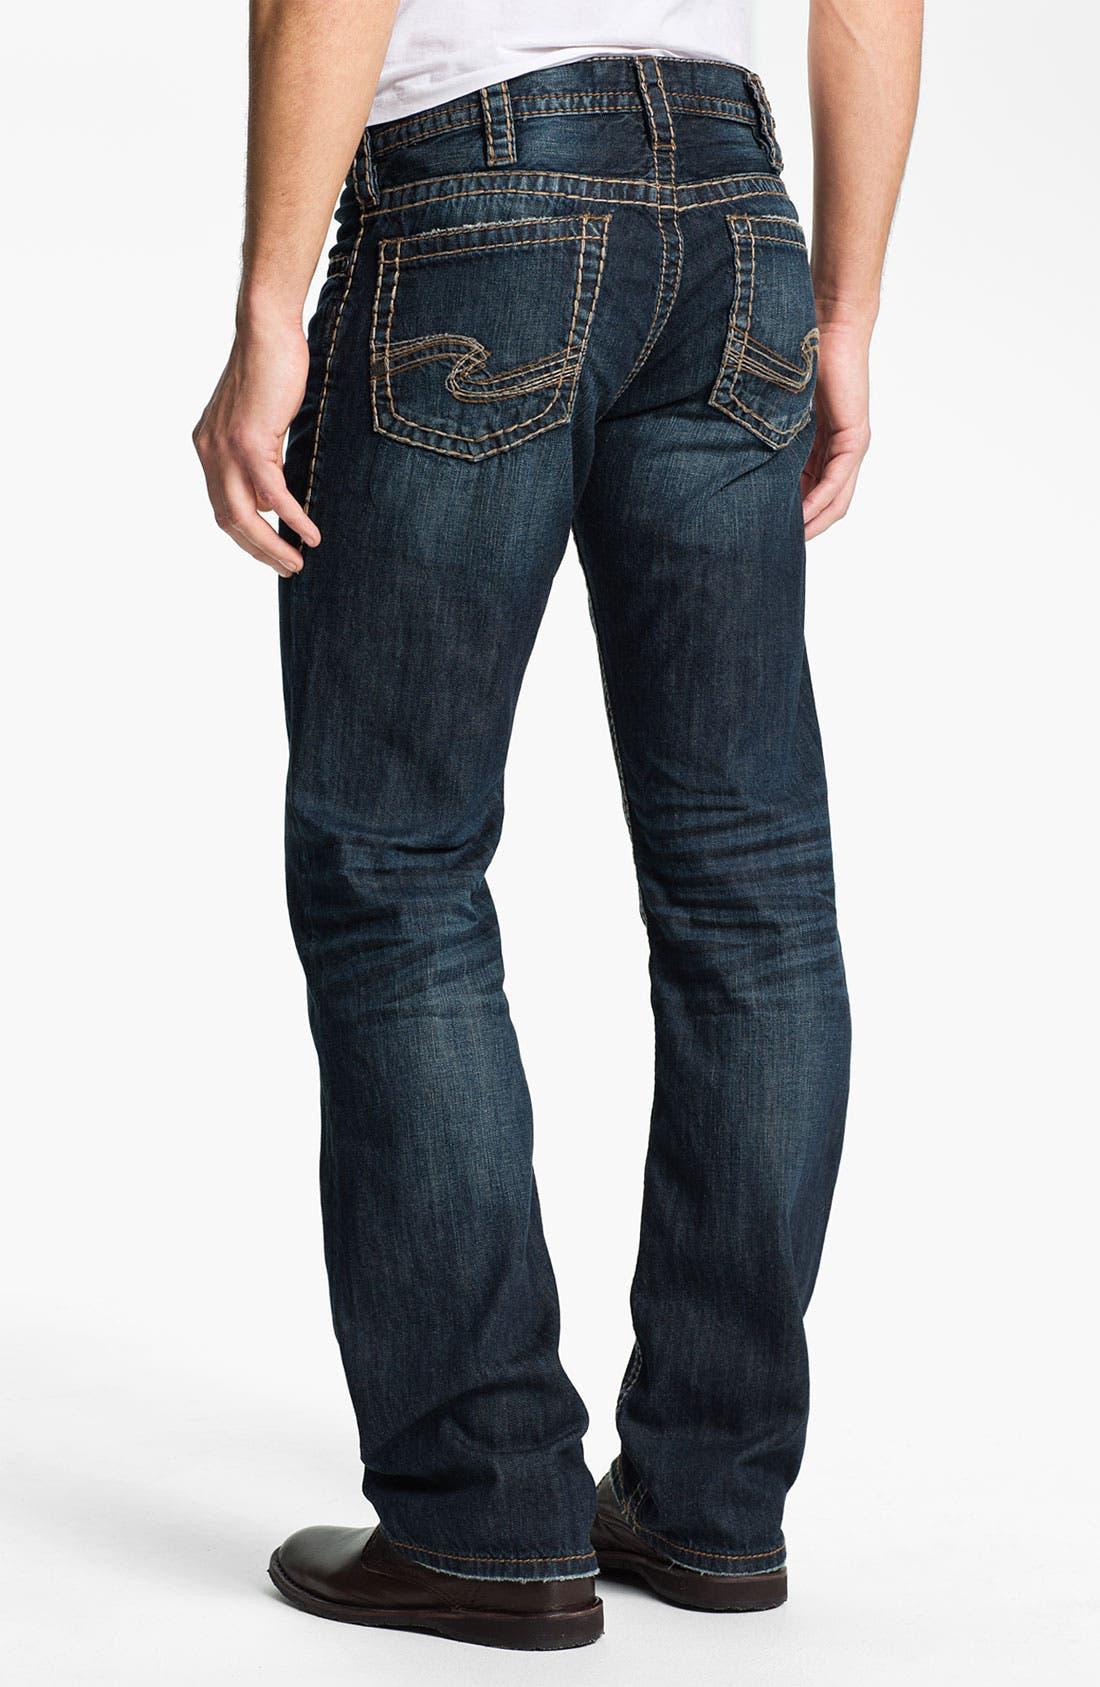 Alternate Image 1 Selected - Silver Jeans Co. 'Nash Heritage' Straight Leg Jeans (Indigo)